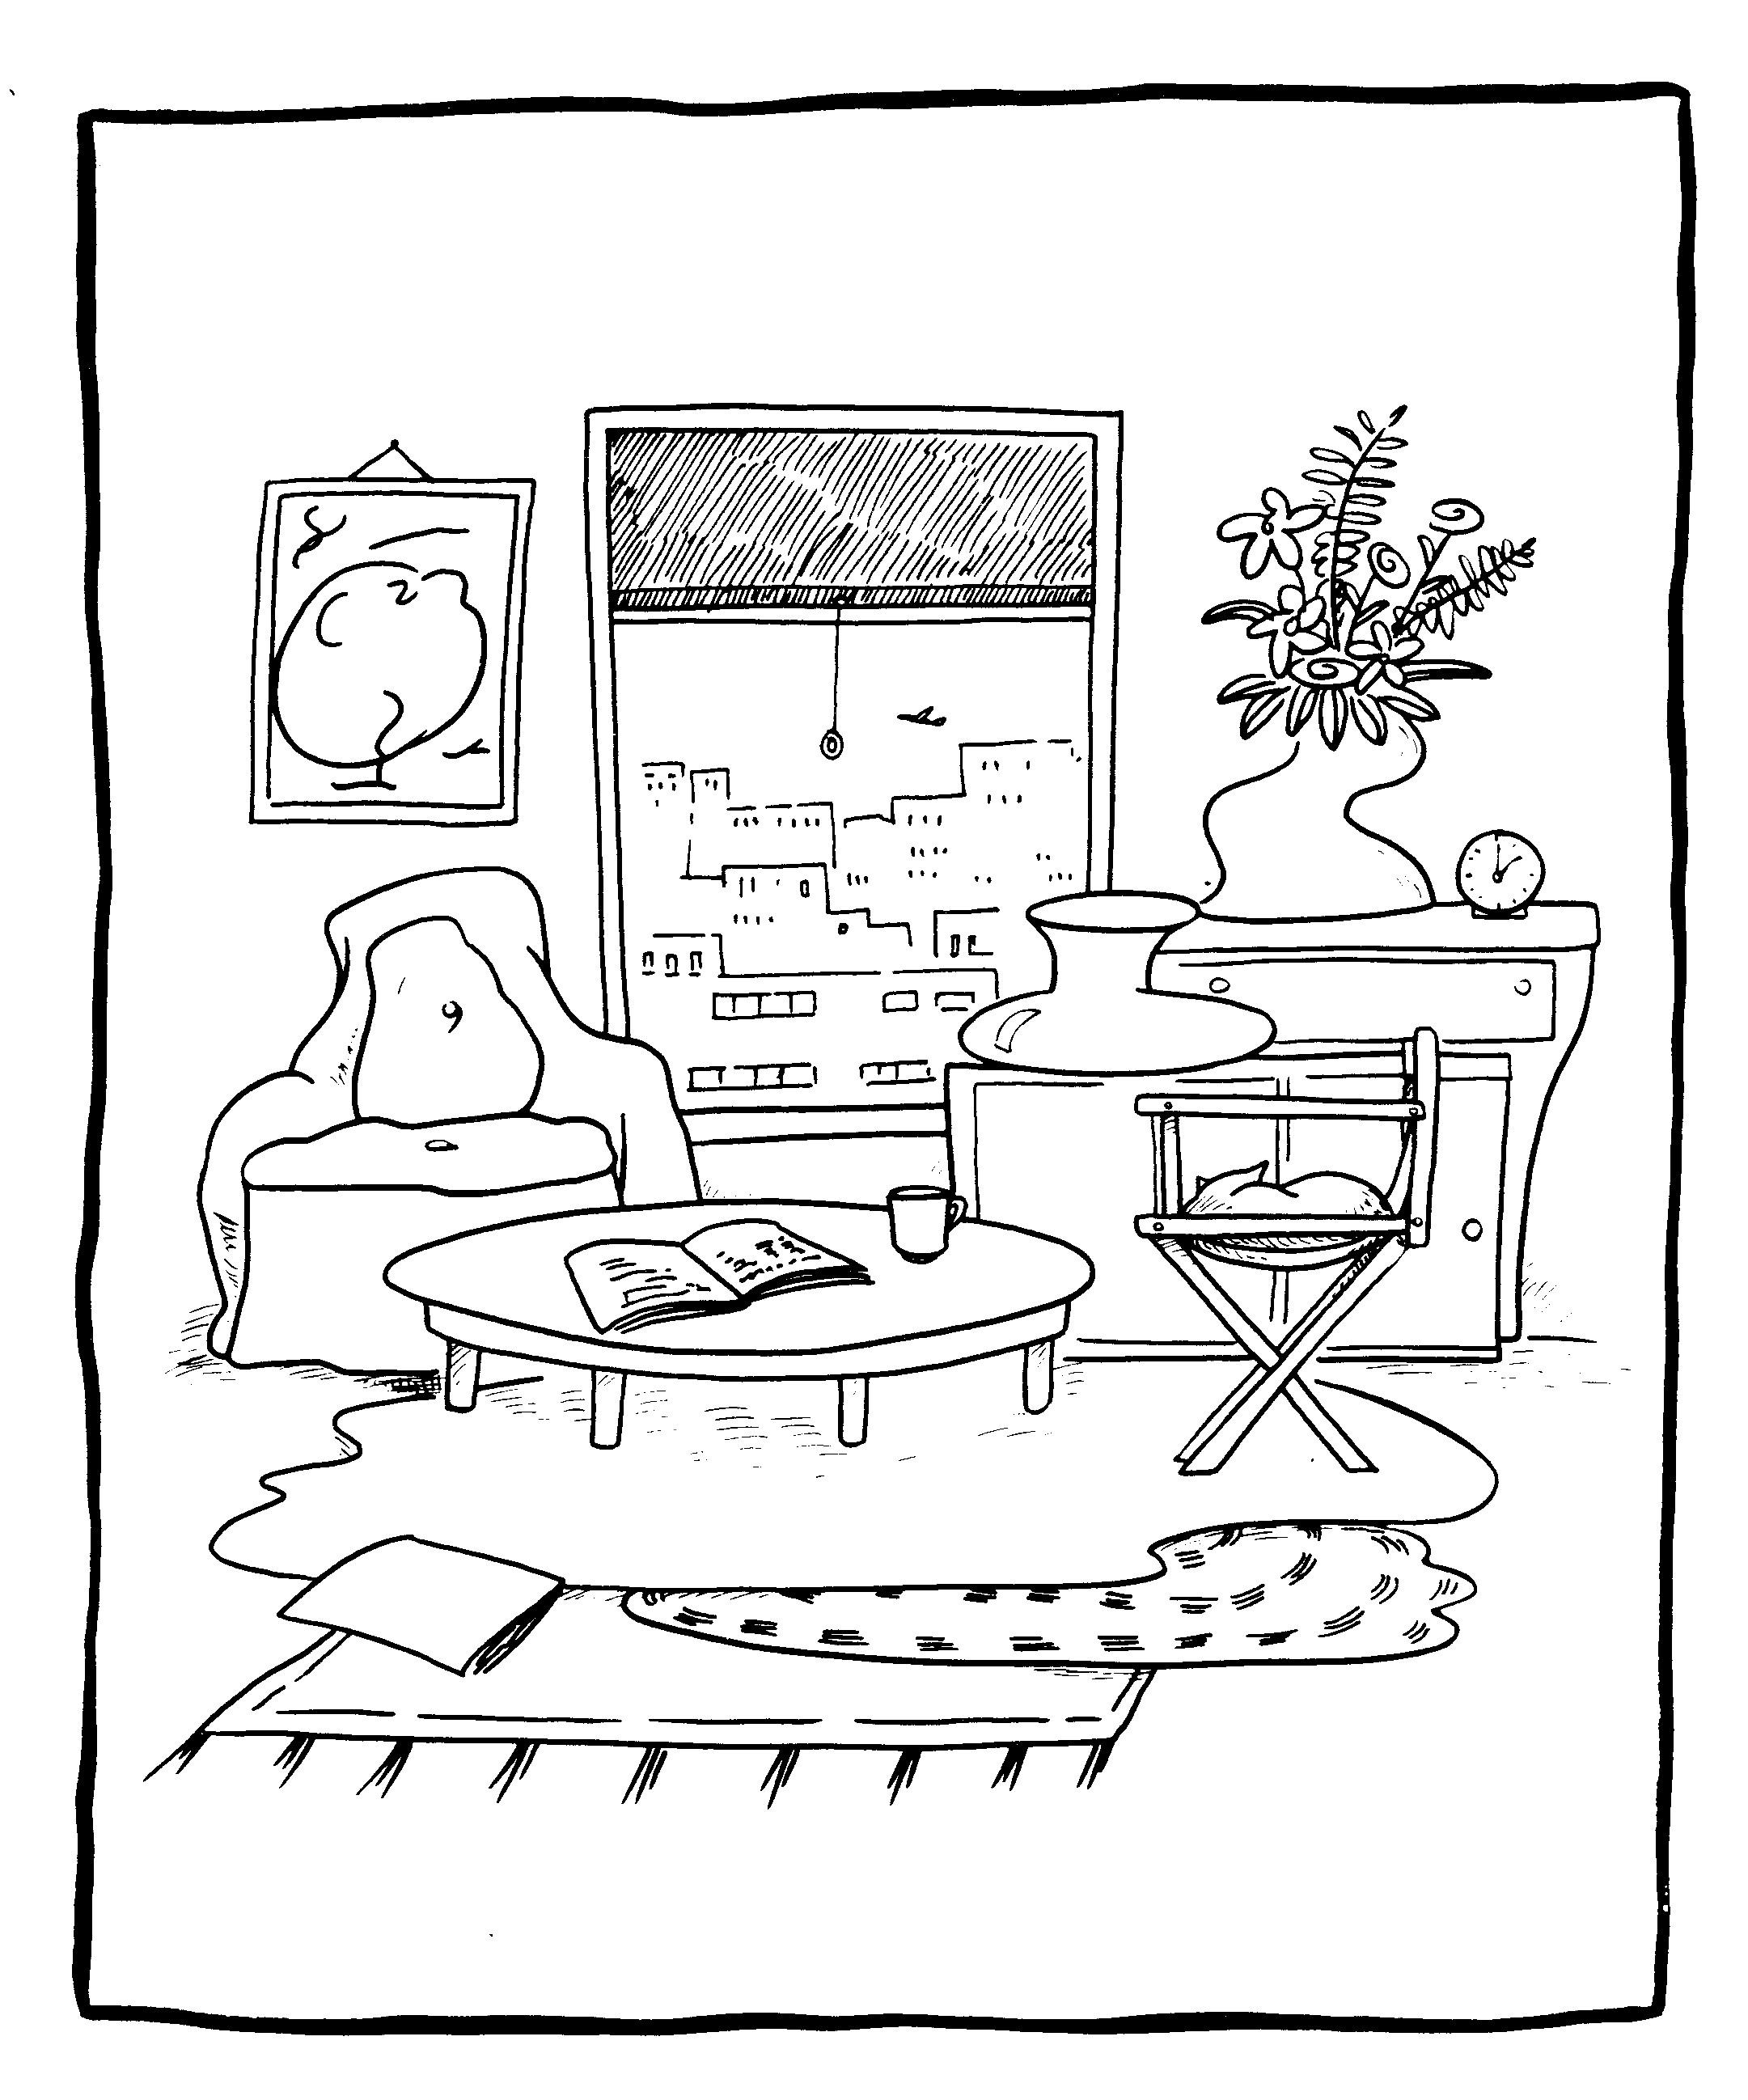 Esl Drawing At Getdrawings